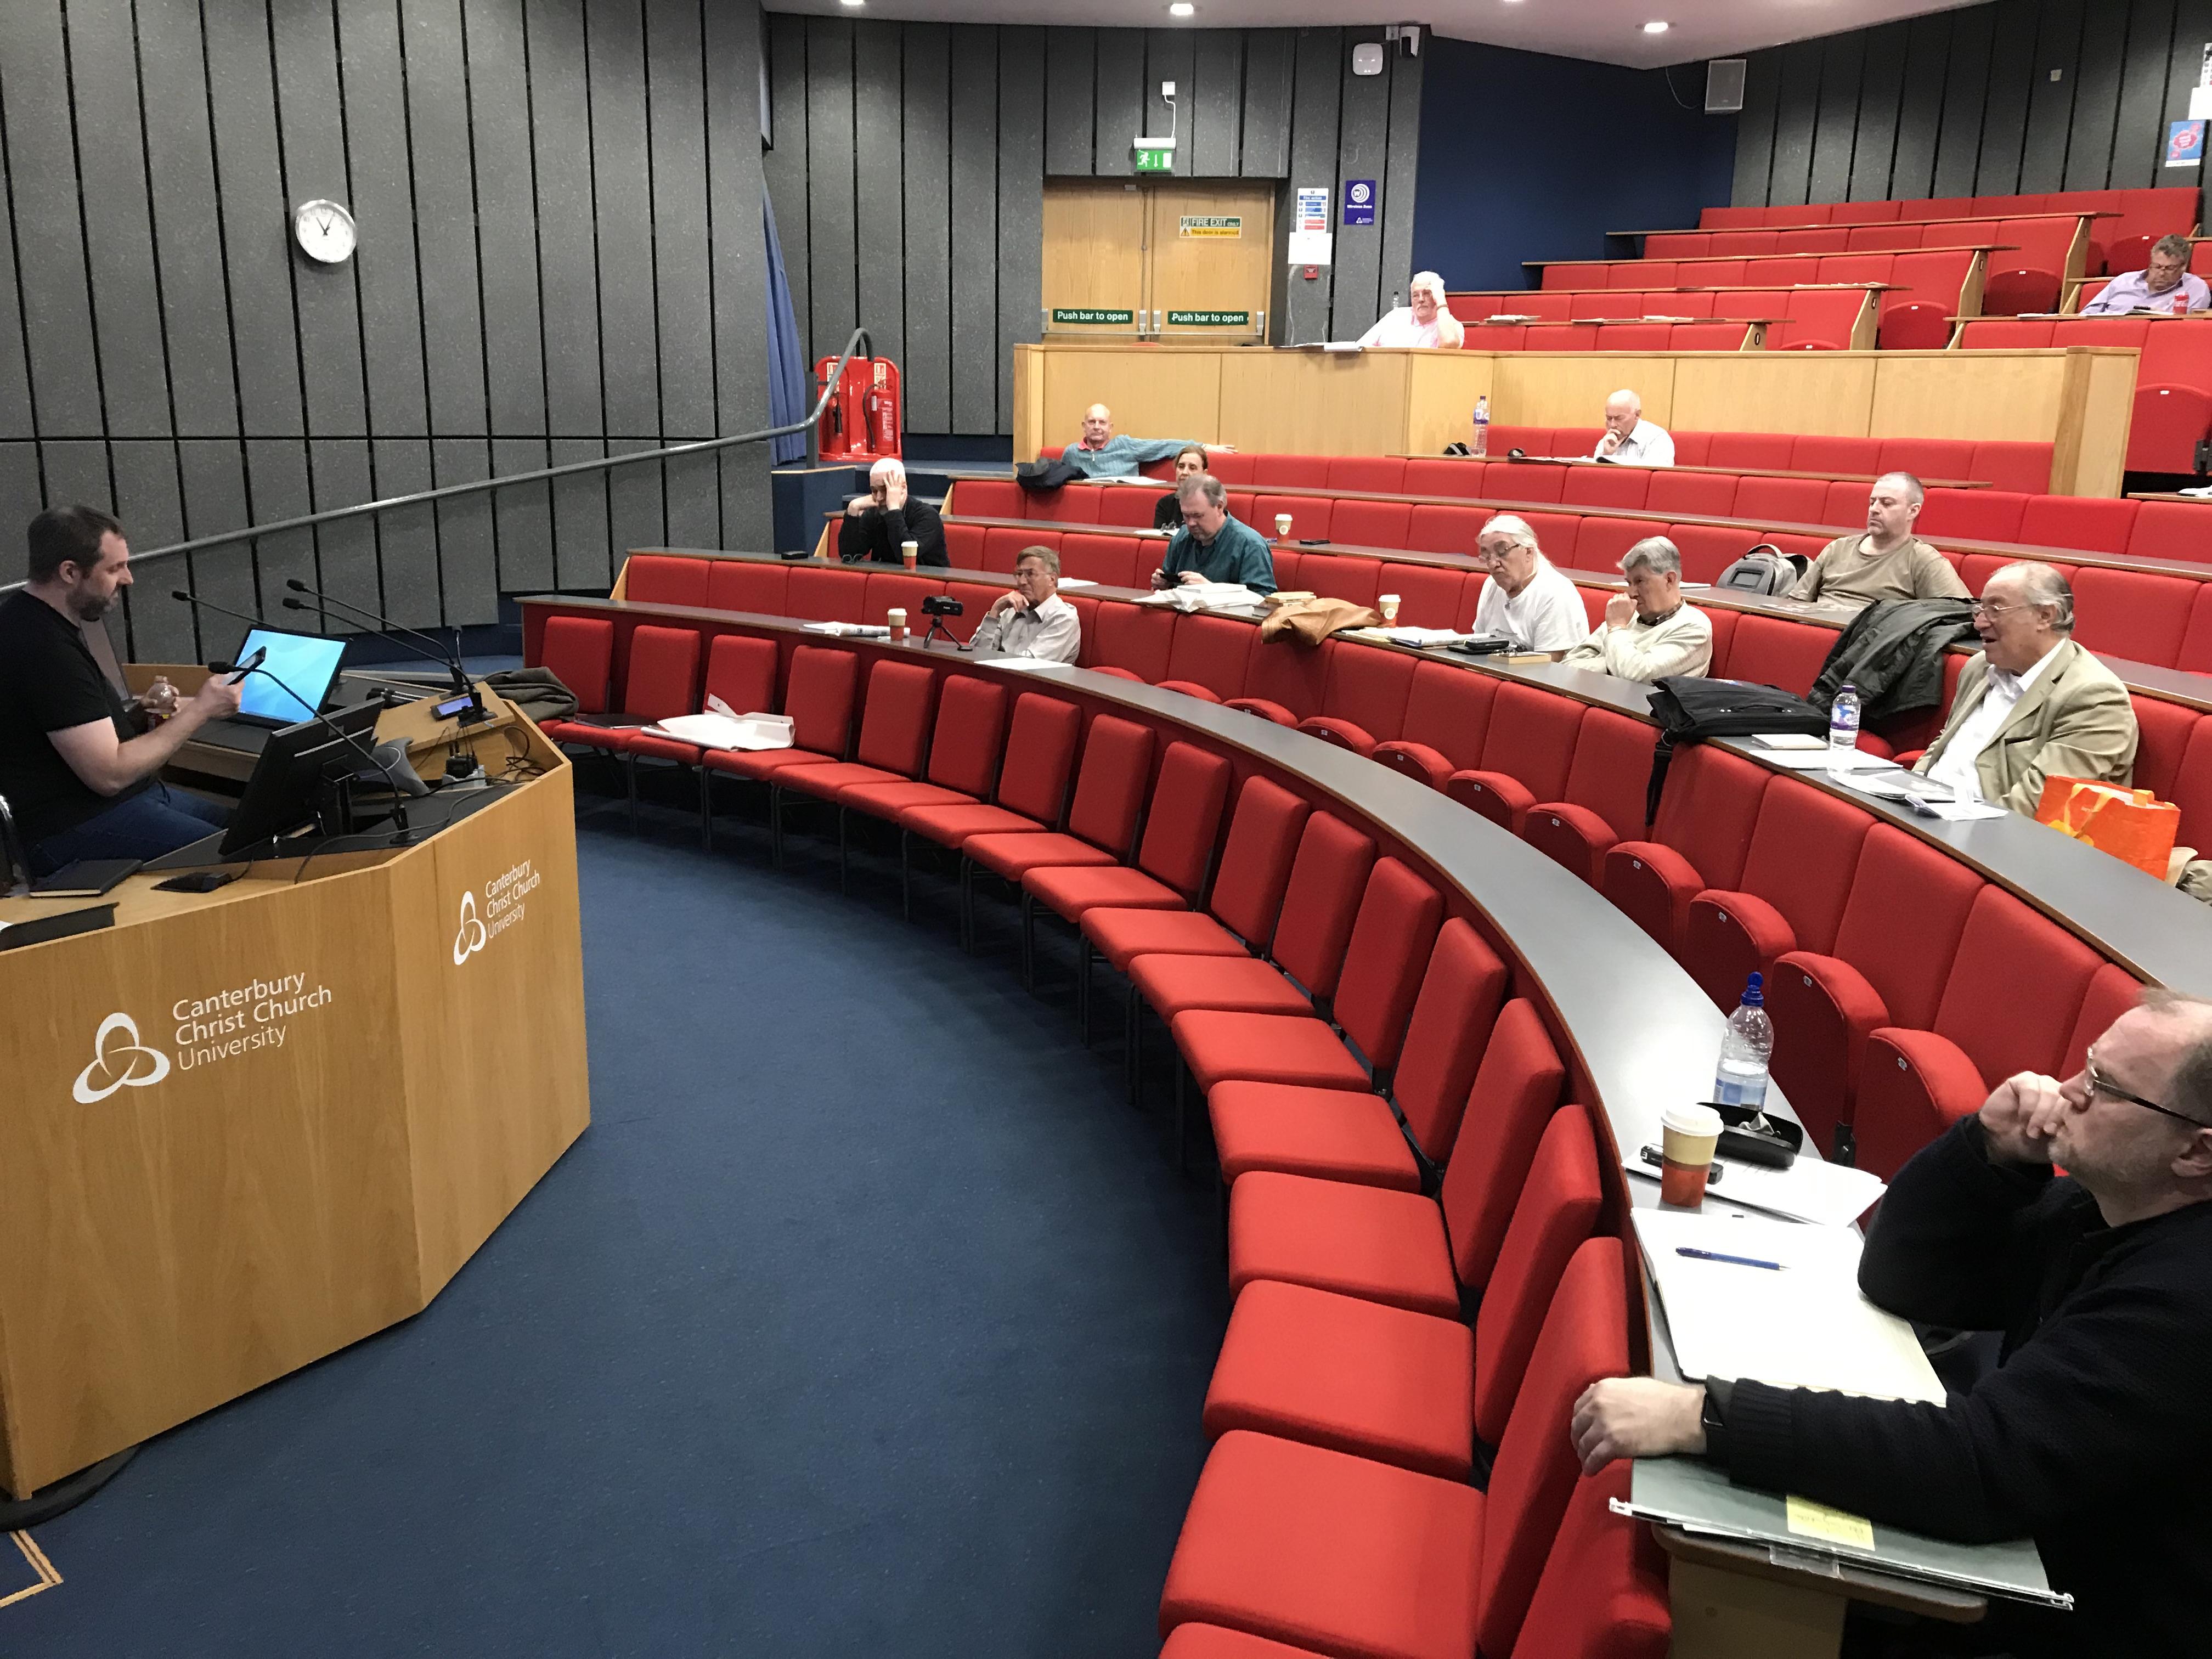 Dealey Plaza UK Canterbury 2019 Seminar